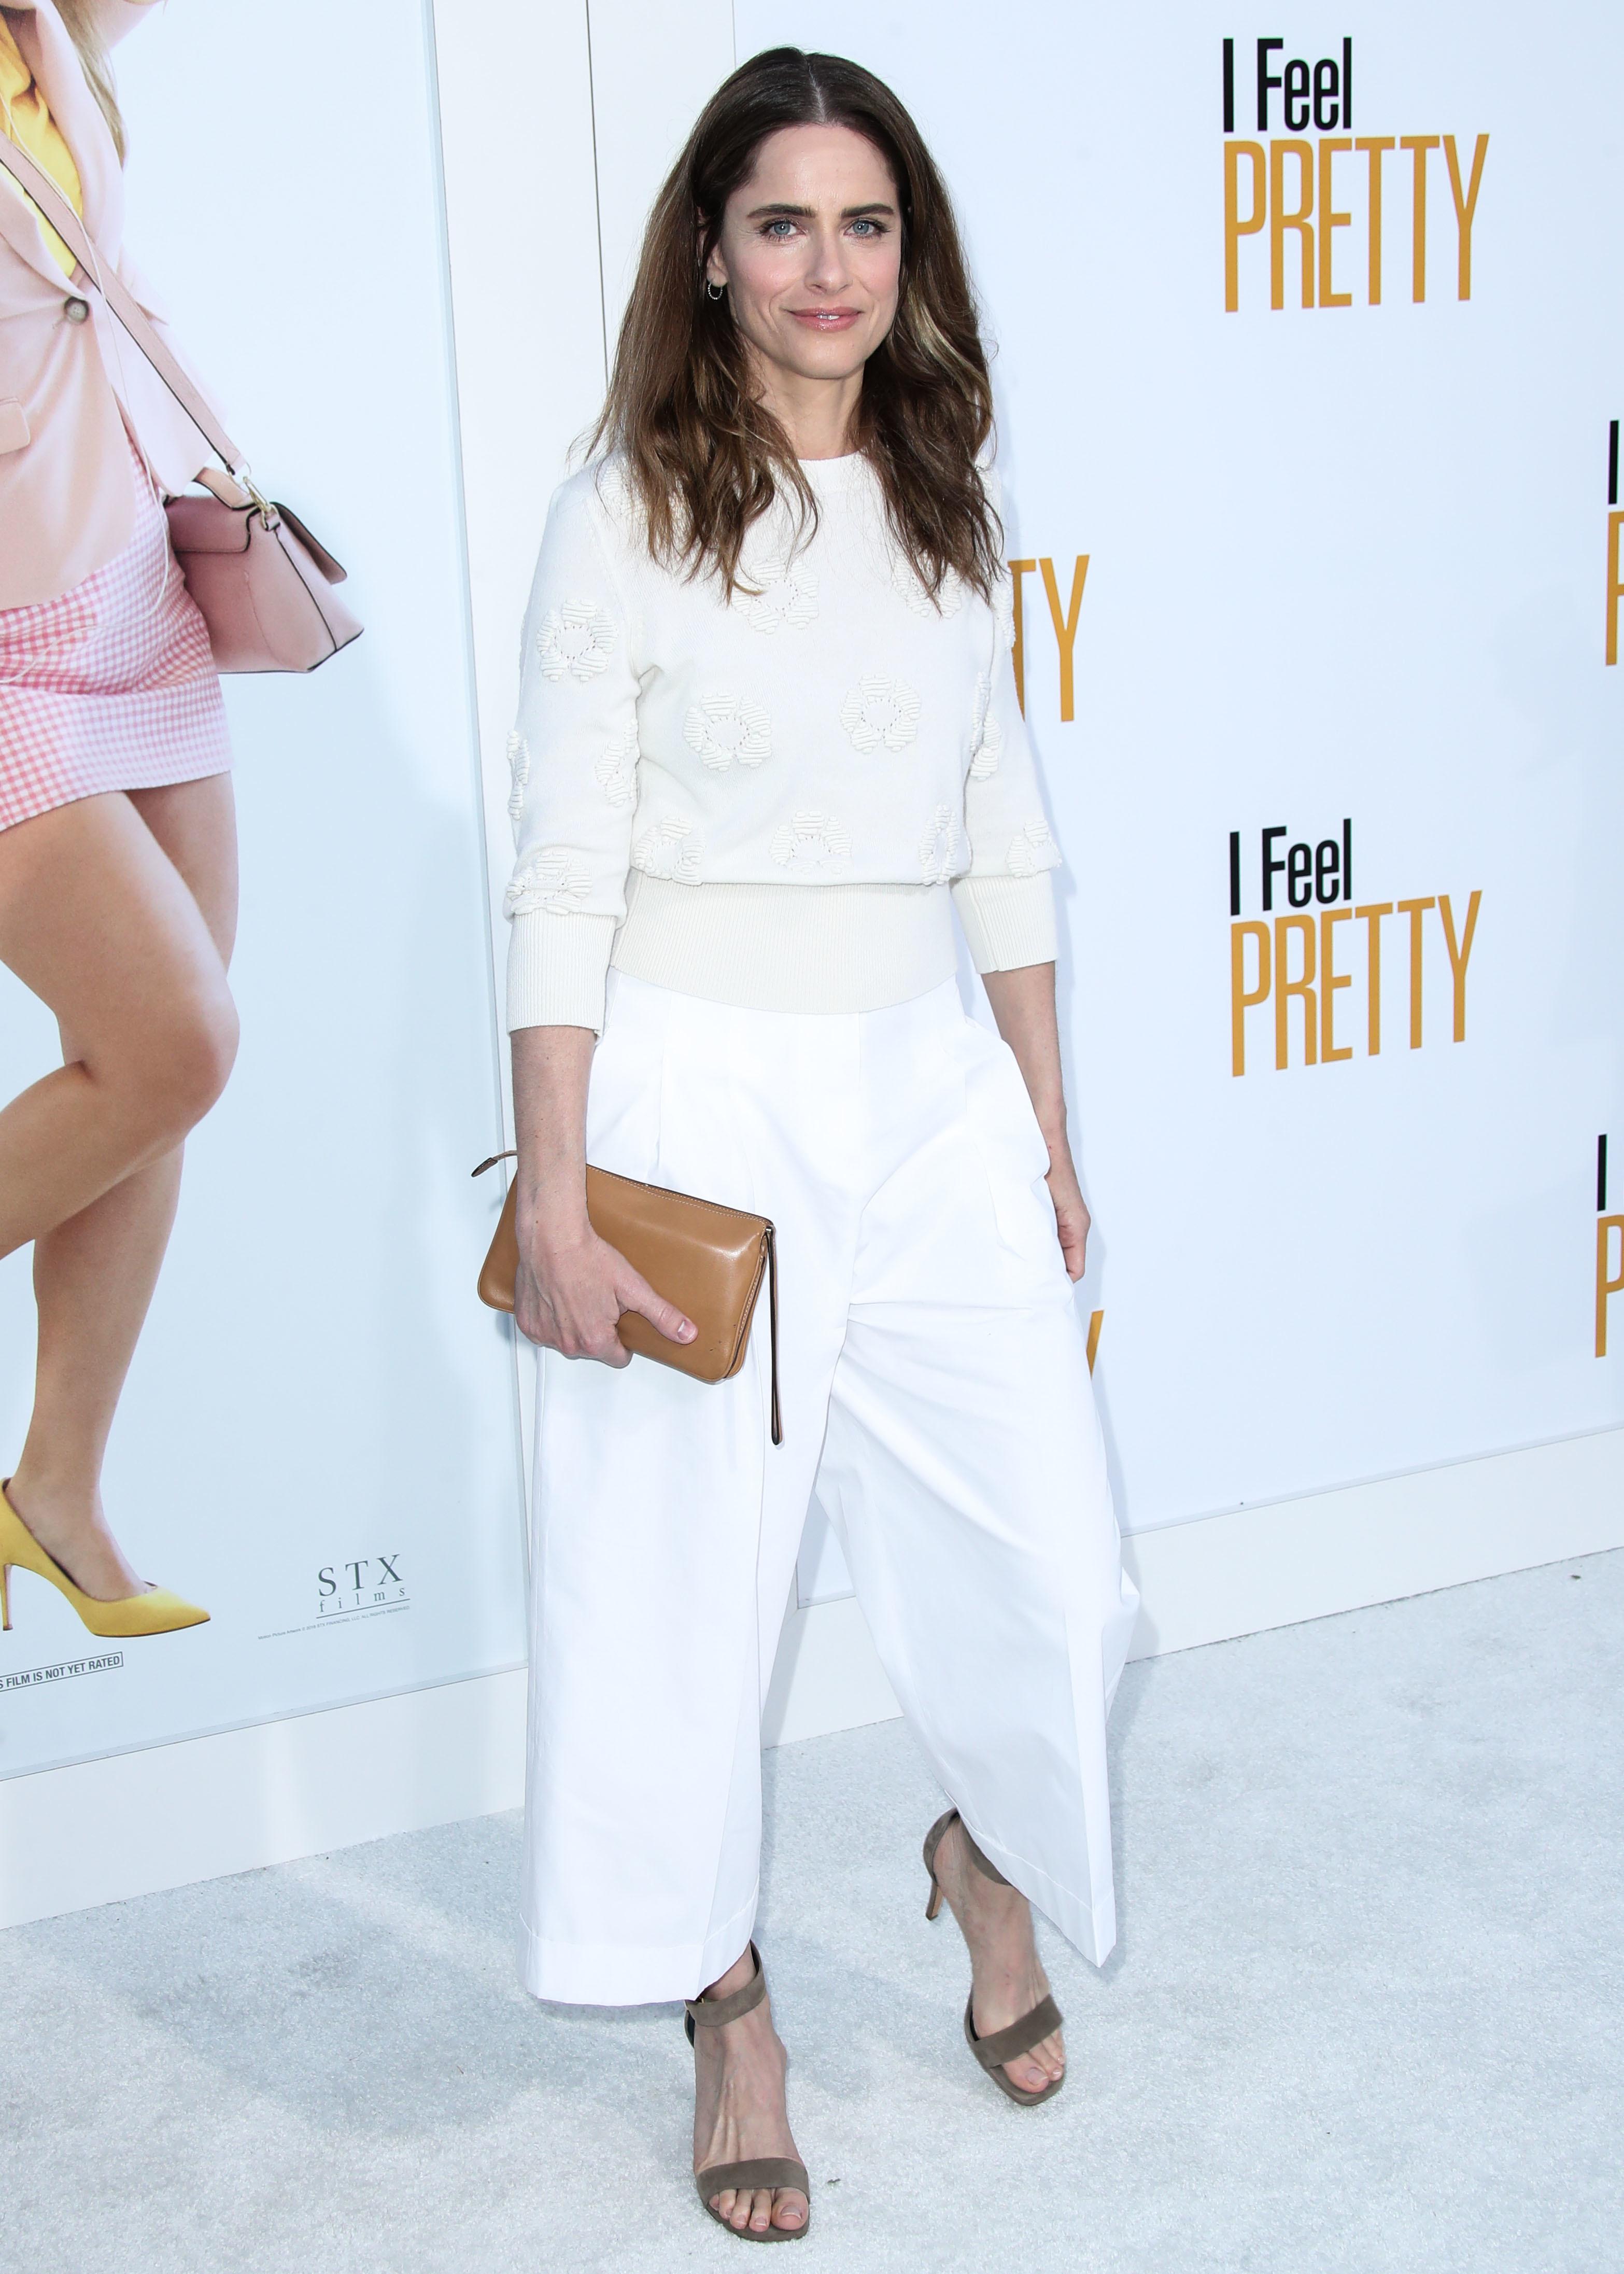 Amanda Peet Hot Pictures amanda peet's feet << wikifeet